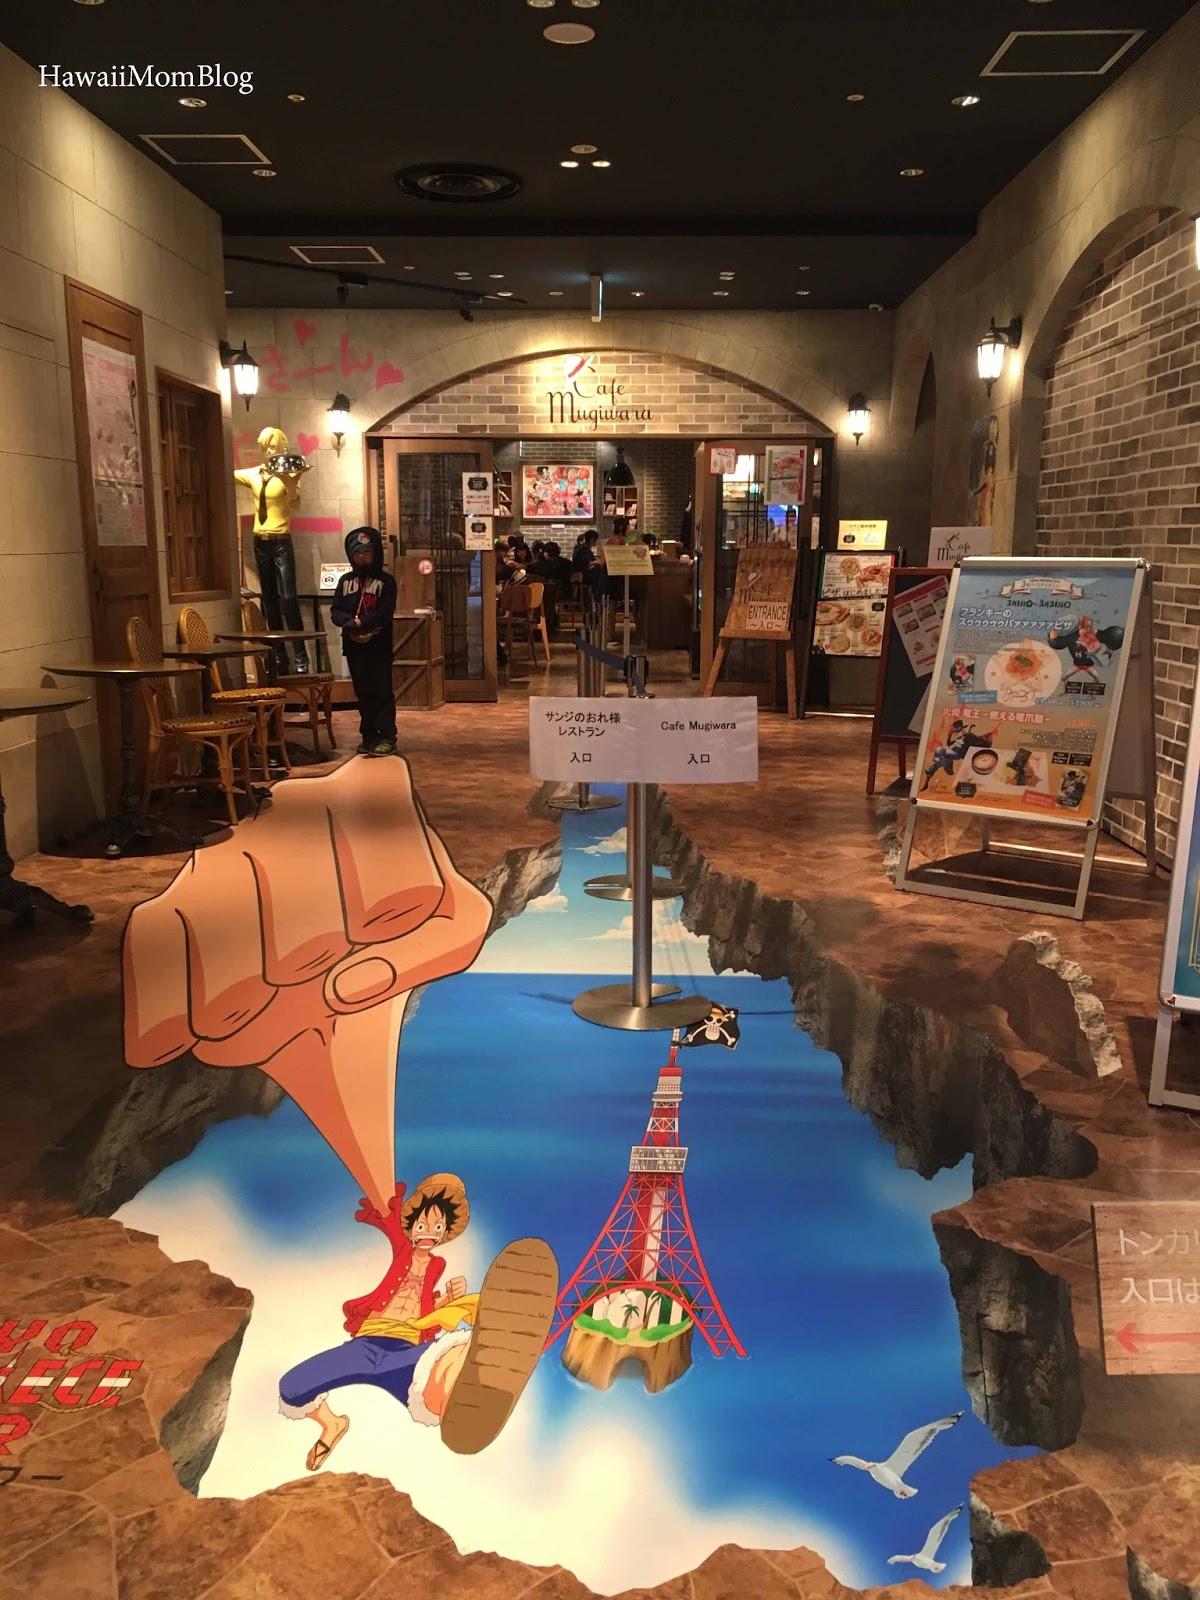 Hawaii Mom Blog: Visit Tokyo: Tokyo One Piece Tower